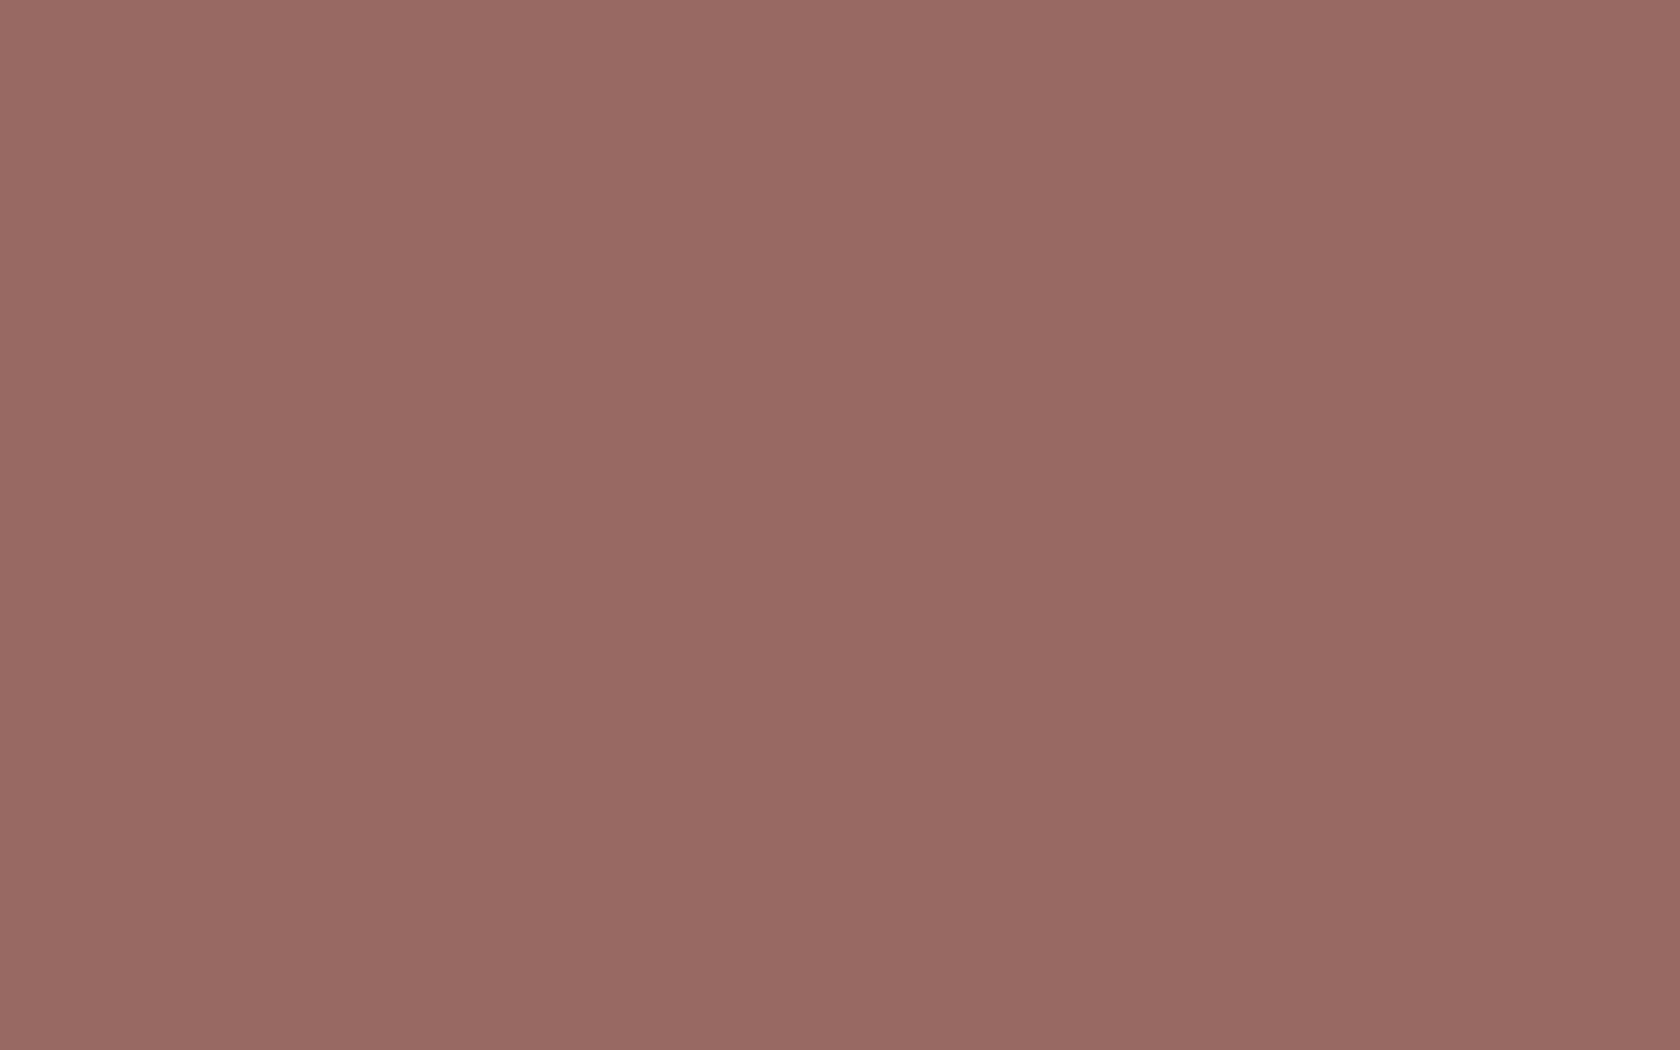 1680x1050 Dark Chestnut Solid Color Background